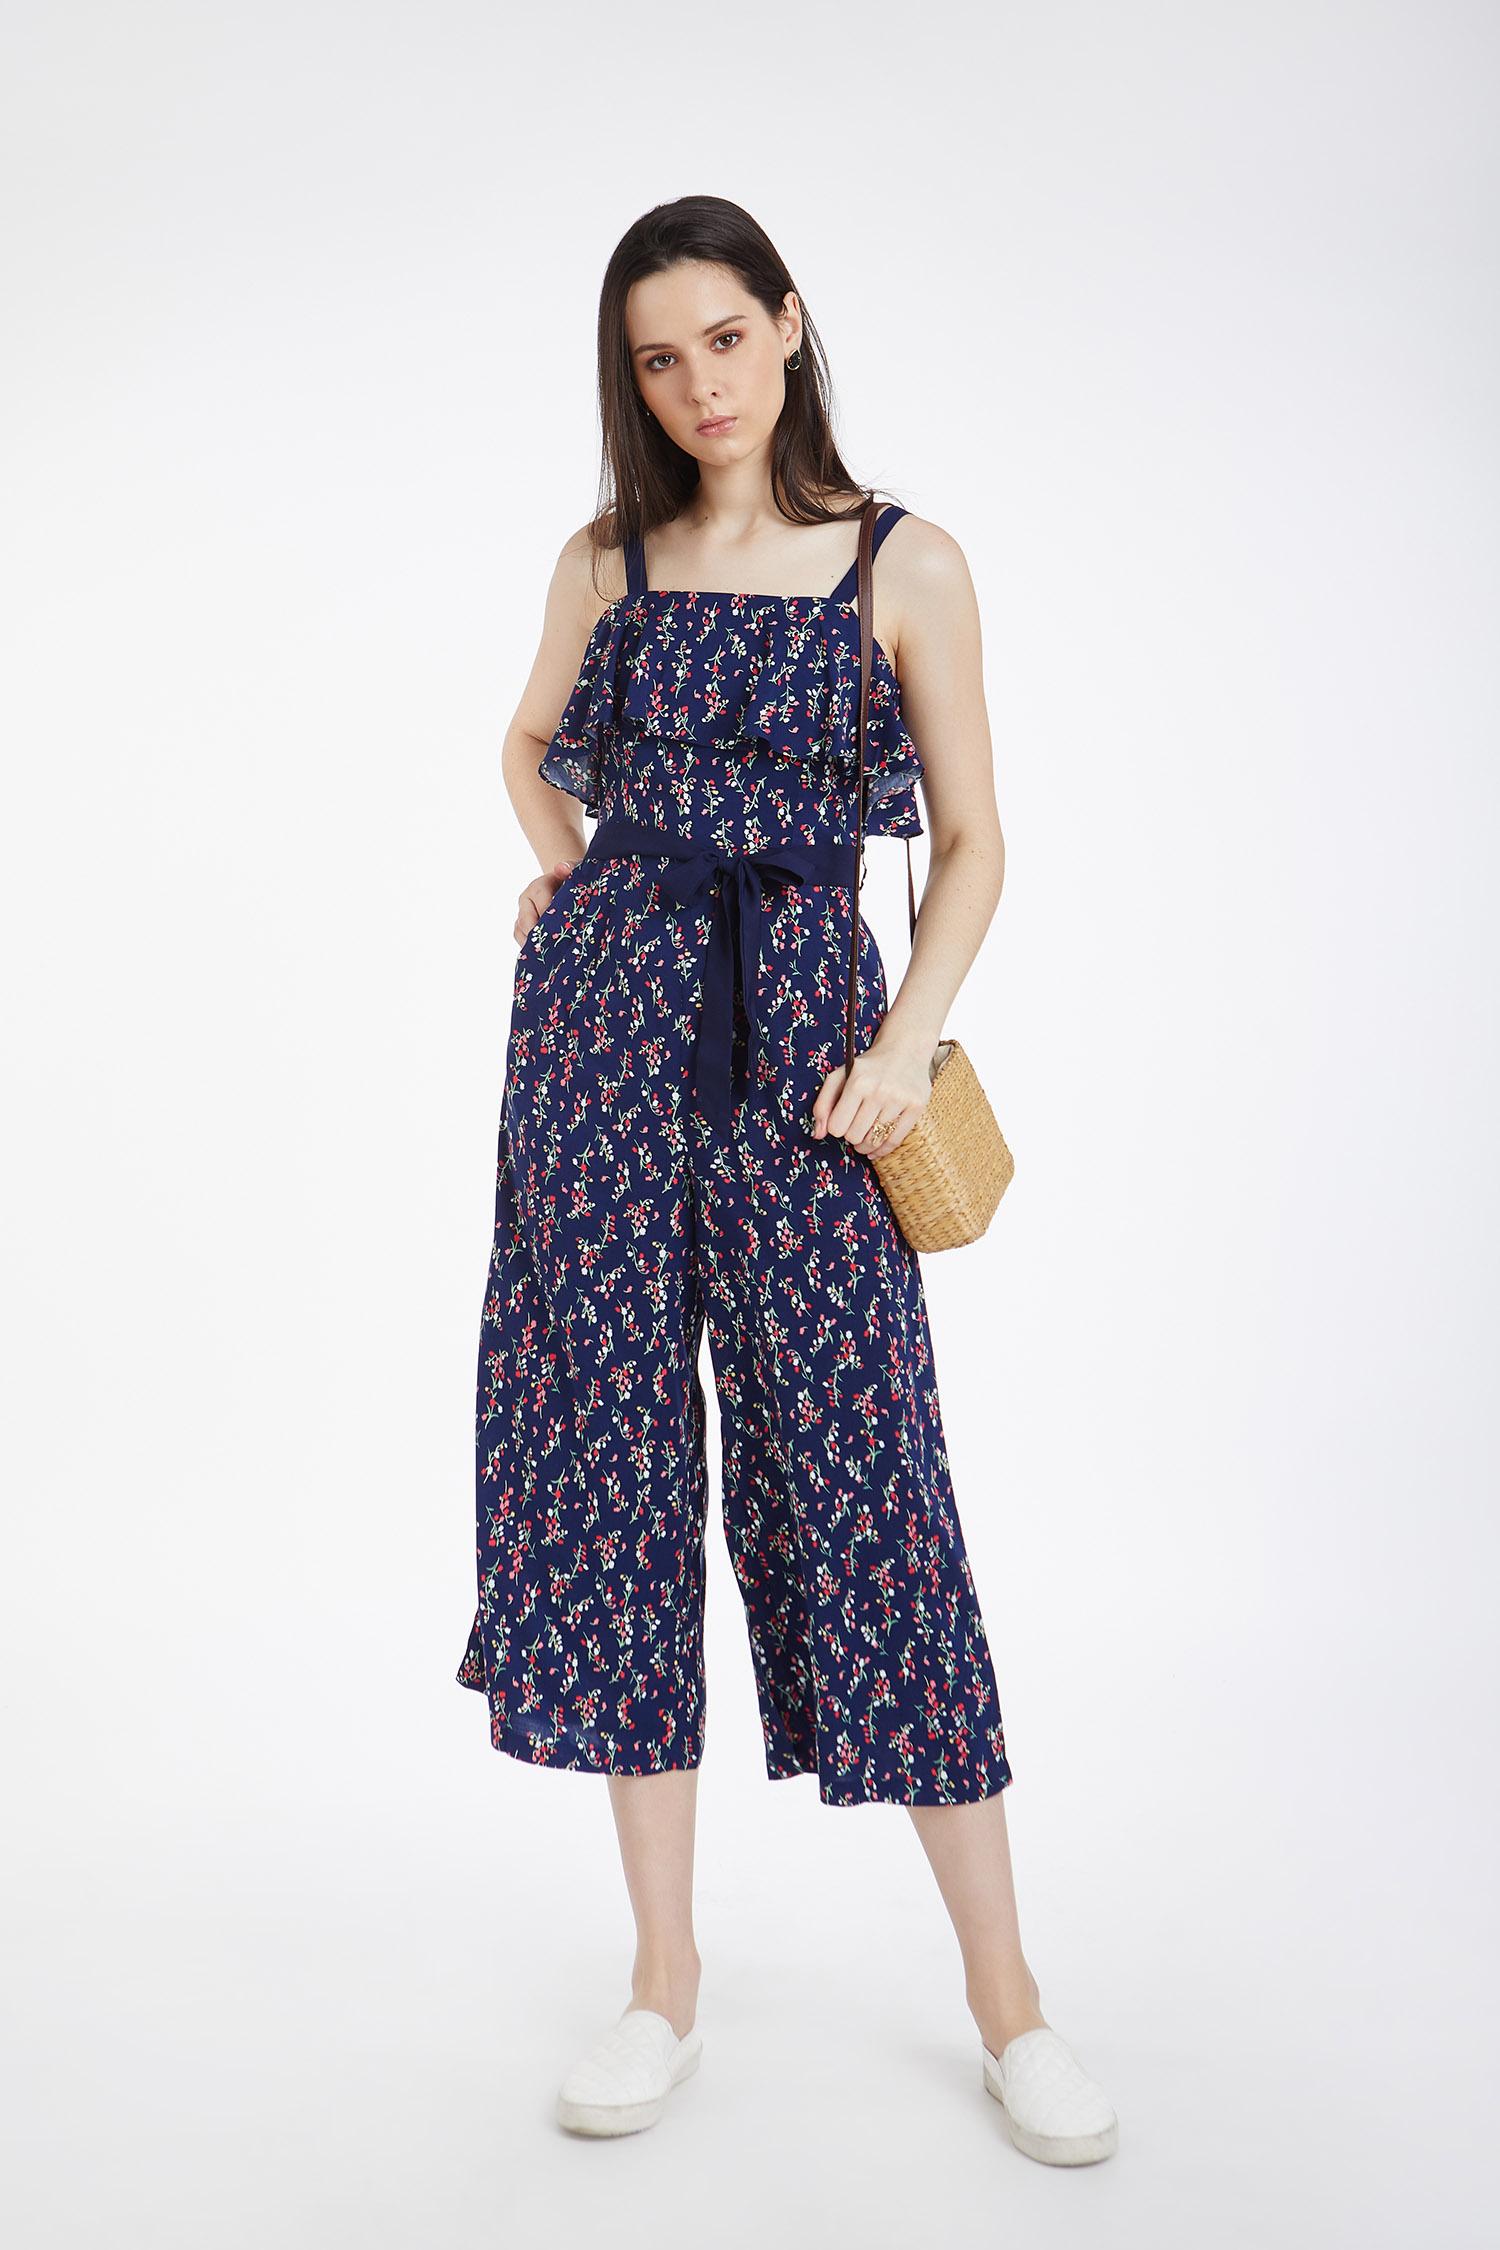 áo liền quần nữ - 1910114